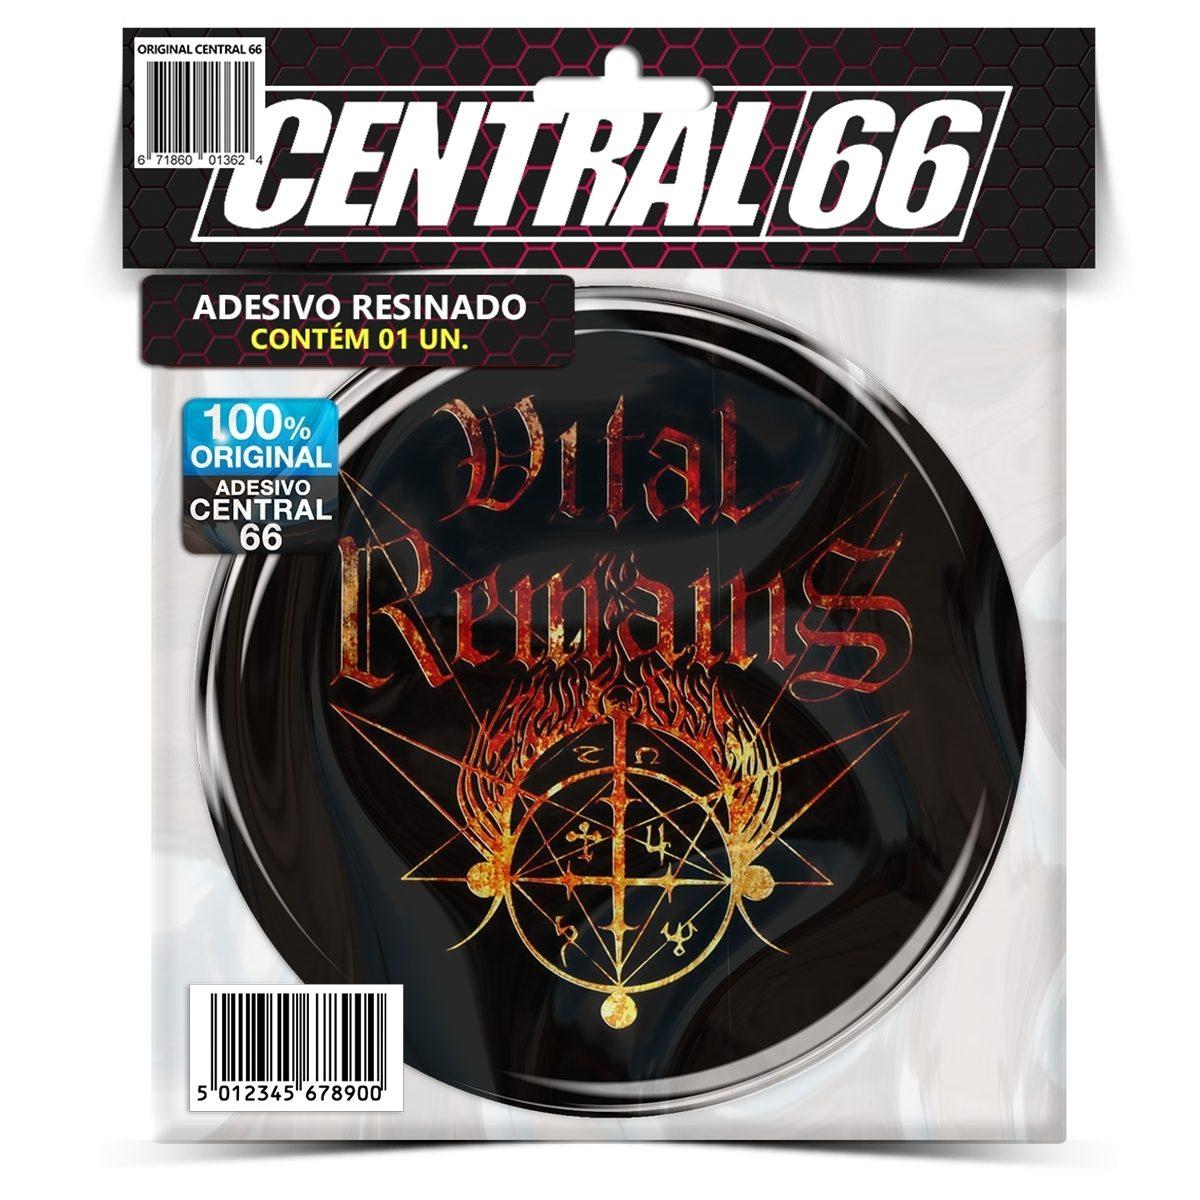 Adesivo Redondo Vital Remains Logo – Central 66